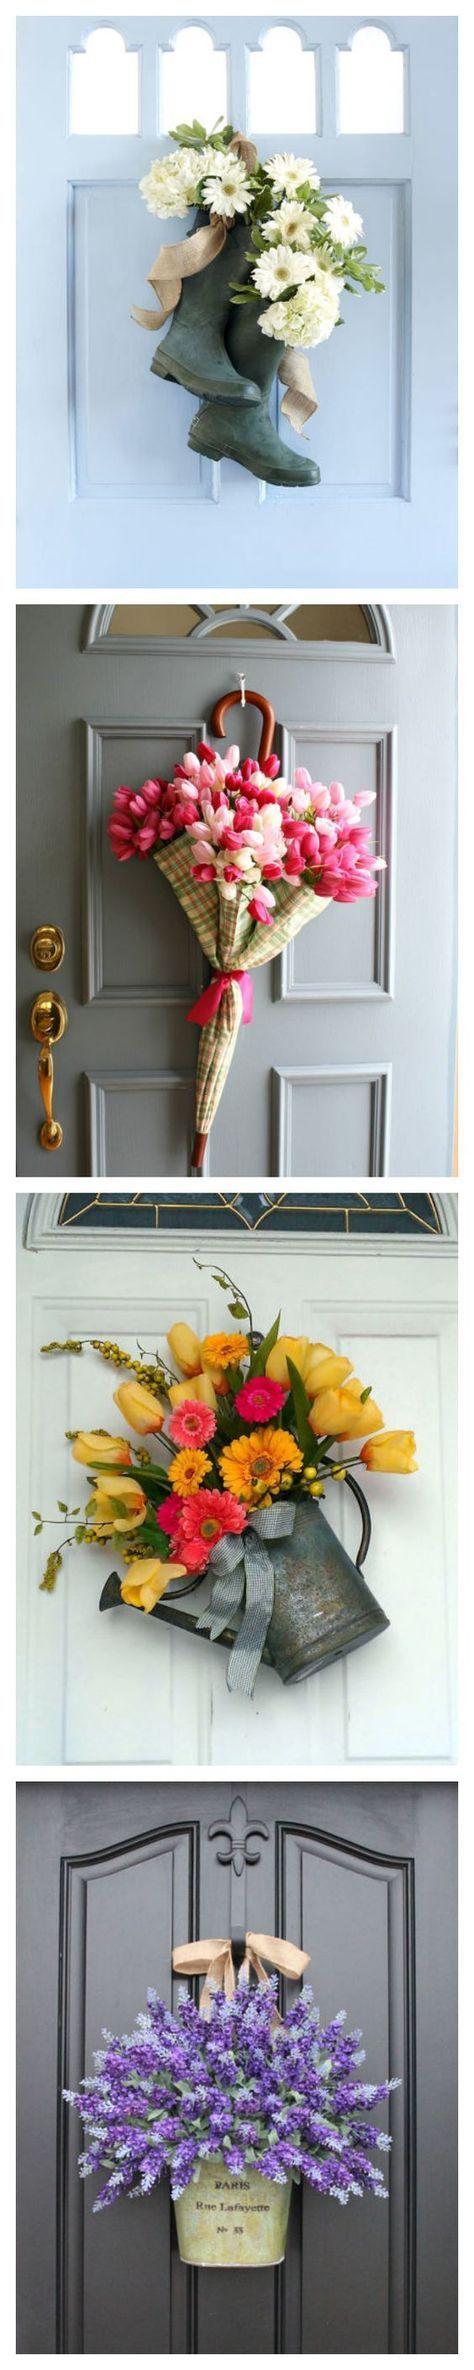 Go Beyond Wreaths with Unusual Door Decorations for Spring #DIY